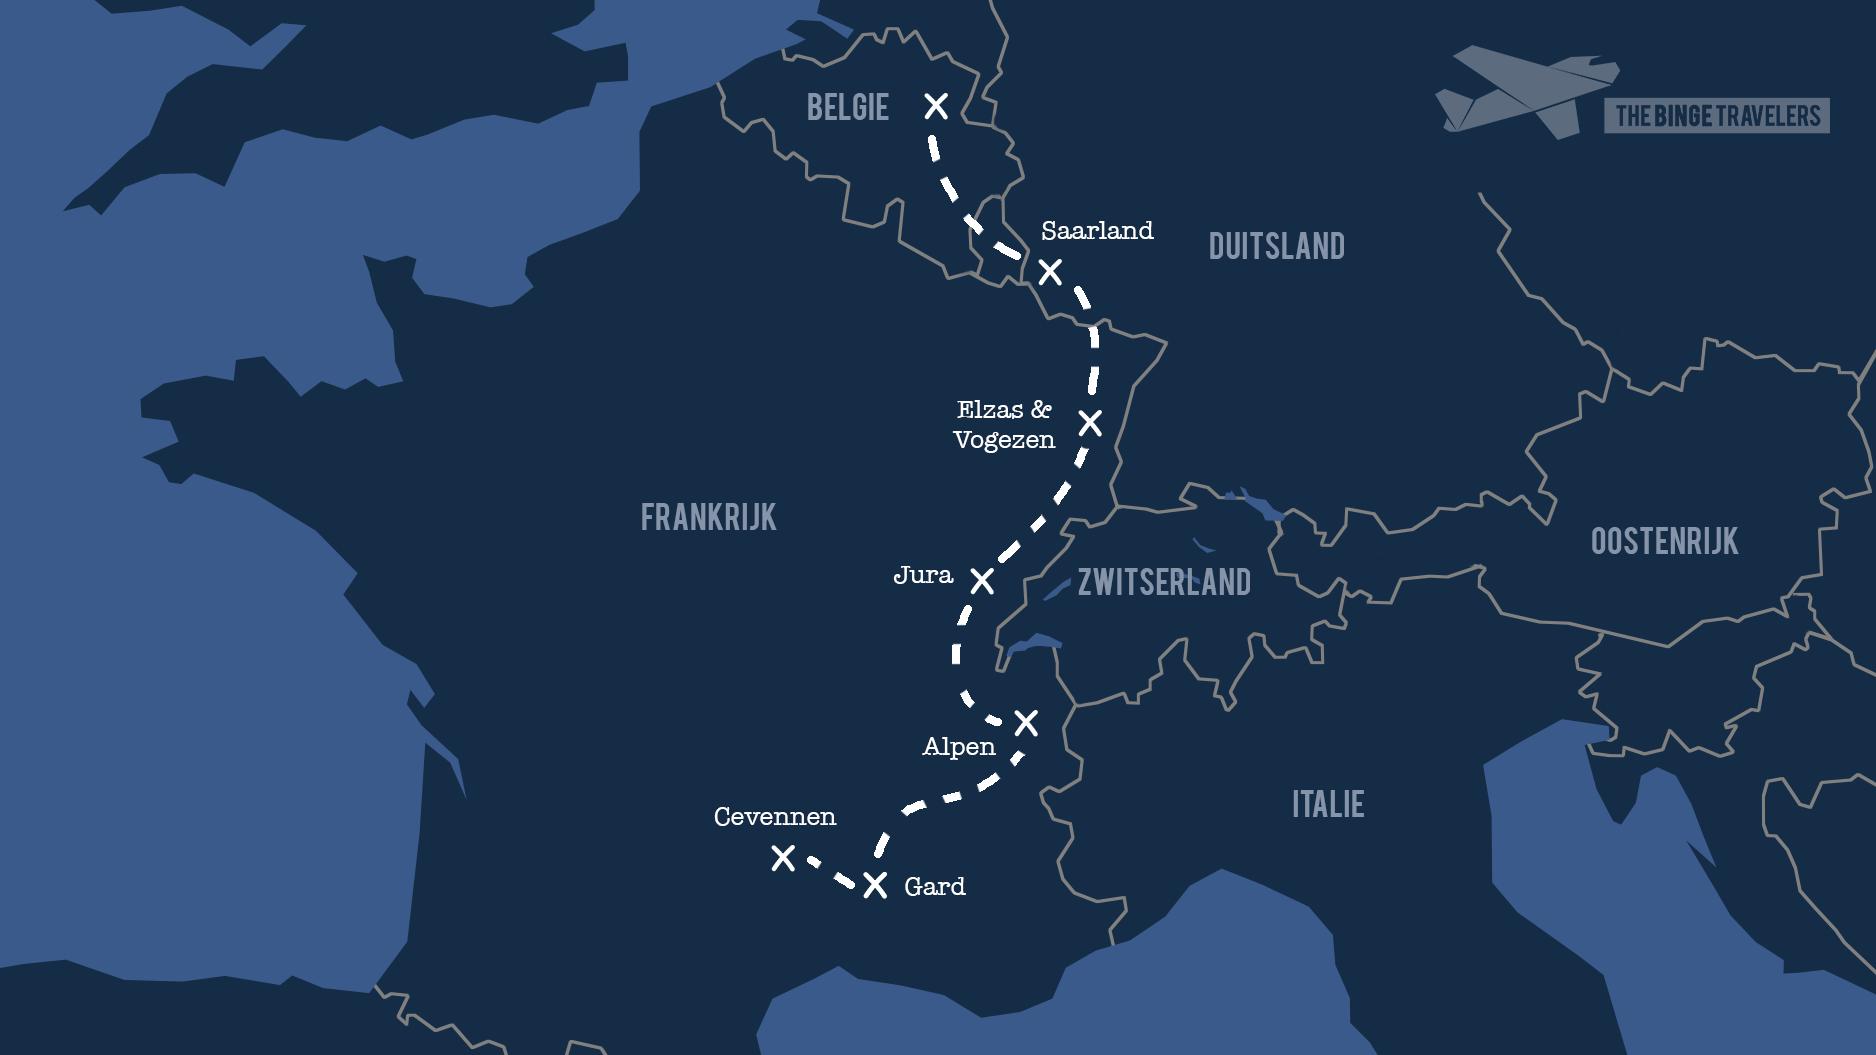 Reisroute Frankrijk